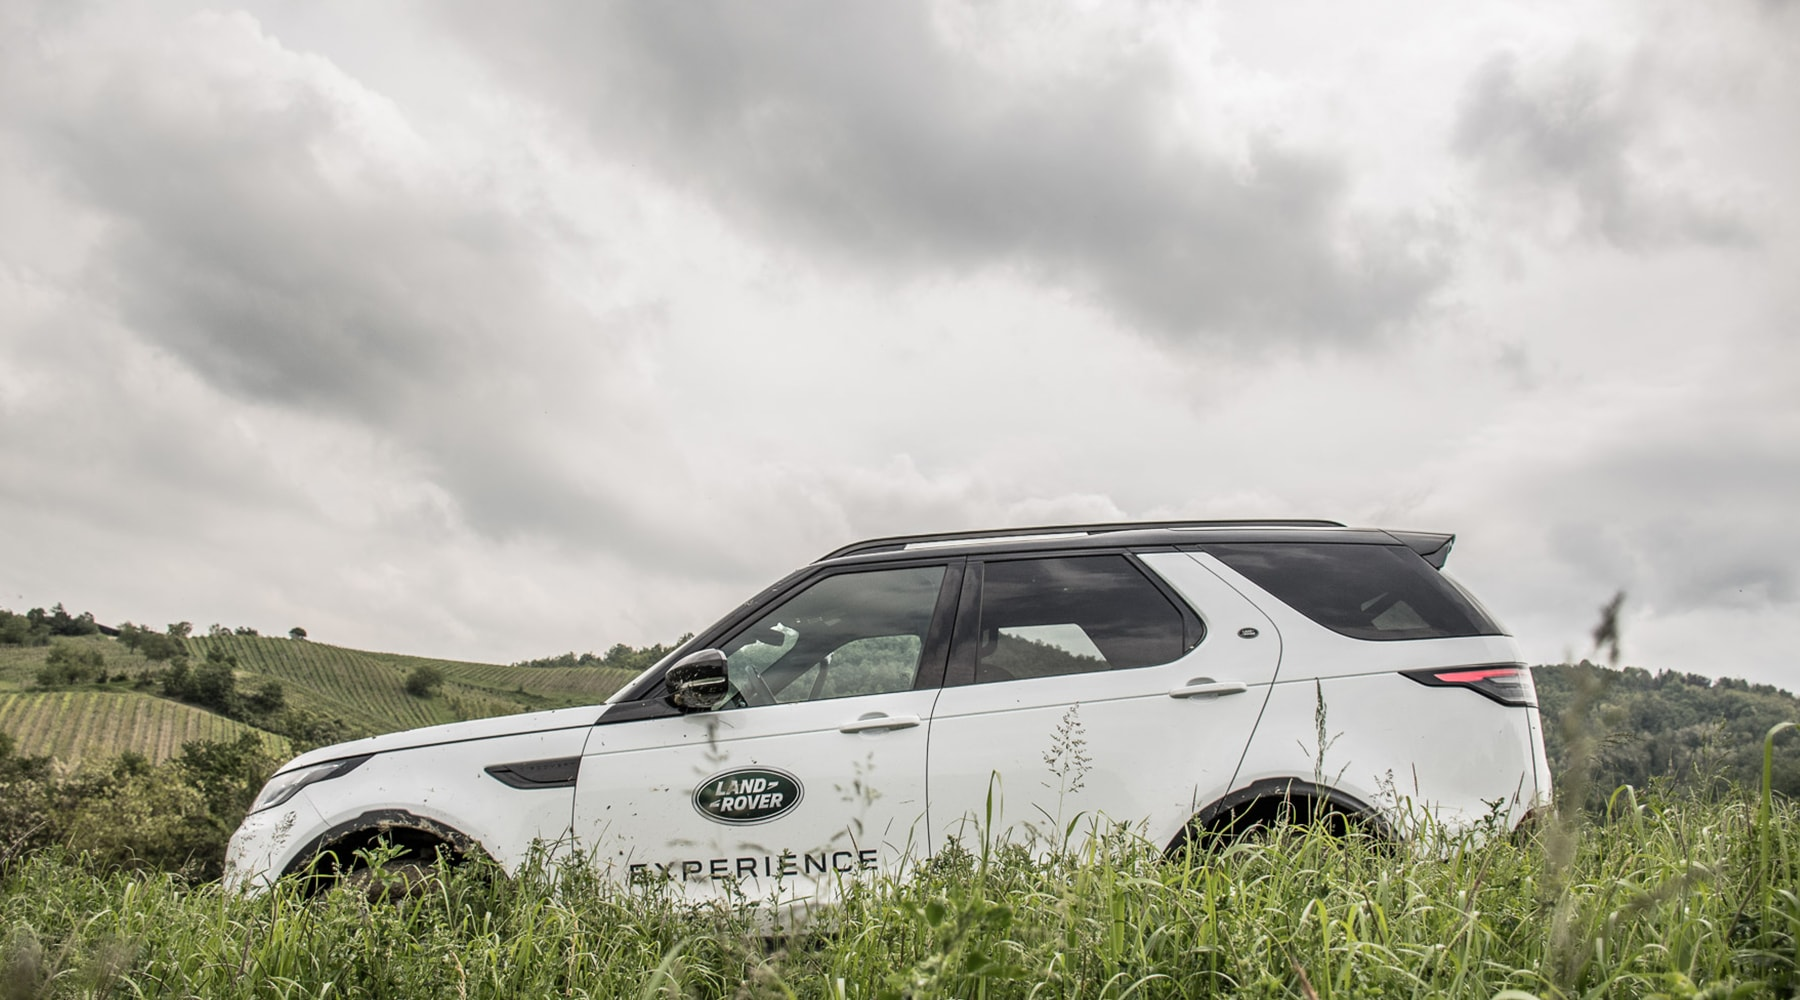 Corso guida off-road land rover experience italiamin